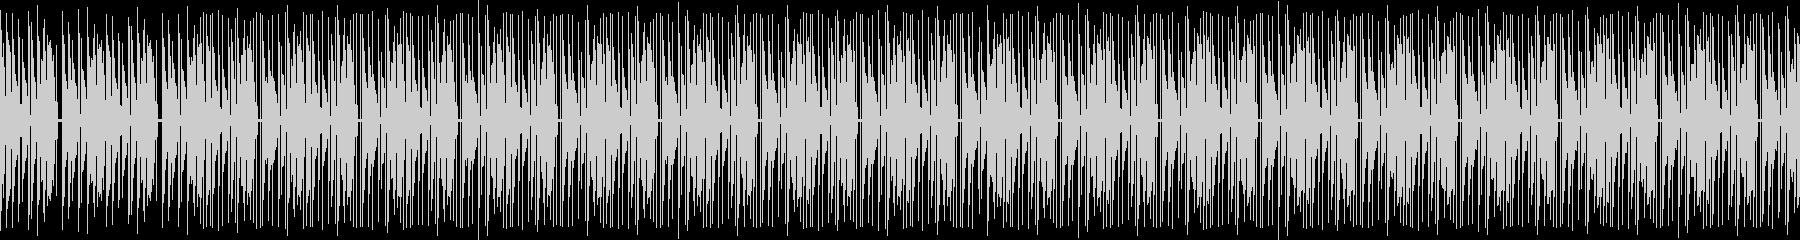 BPM95のヒップホップ風ビートの未再生の波形